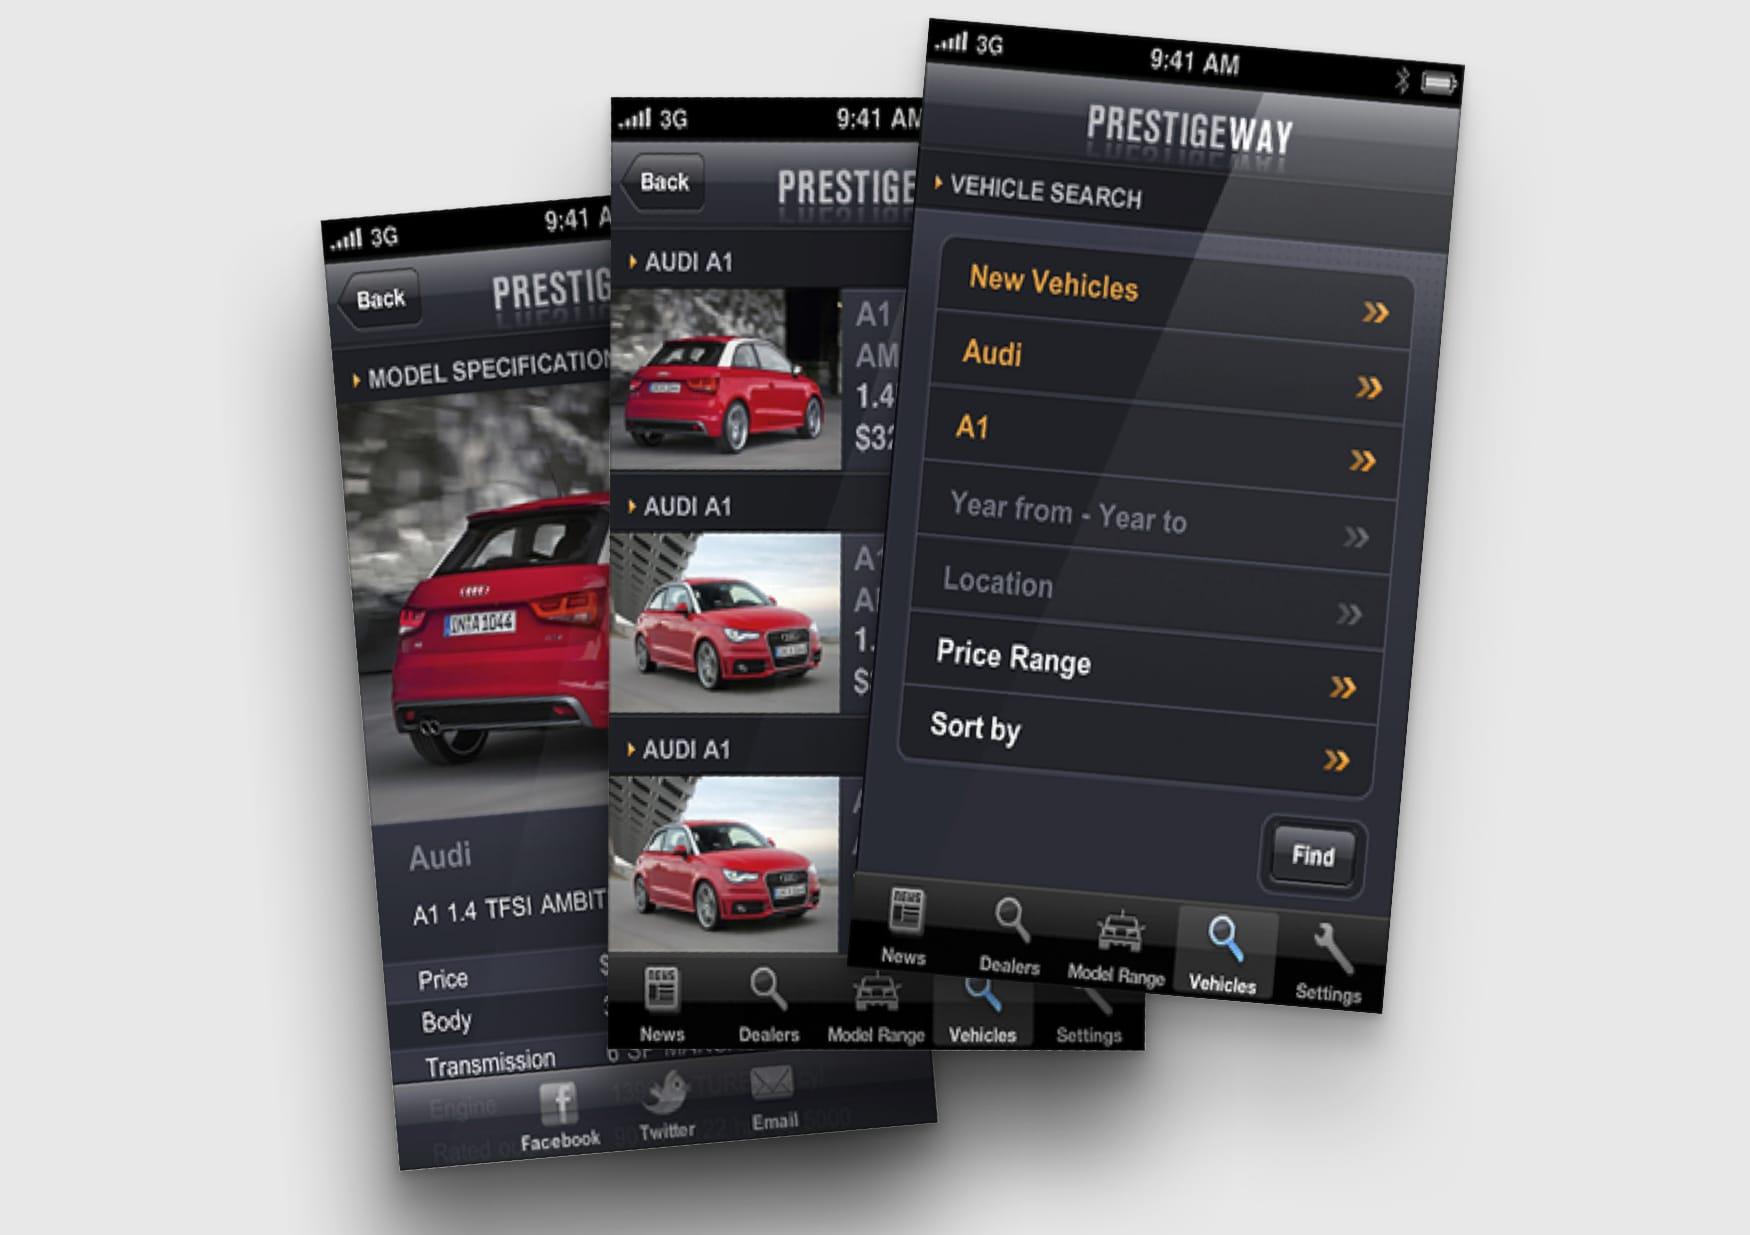 PrestigeWay-Platform-008